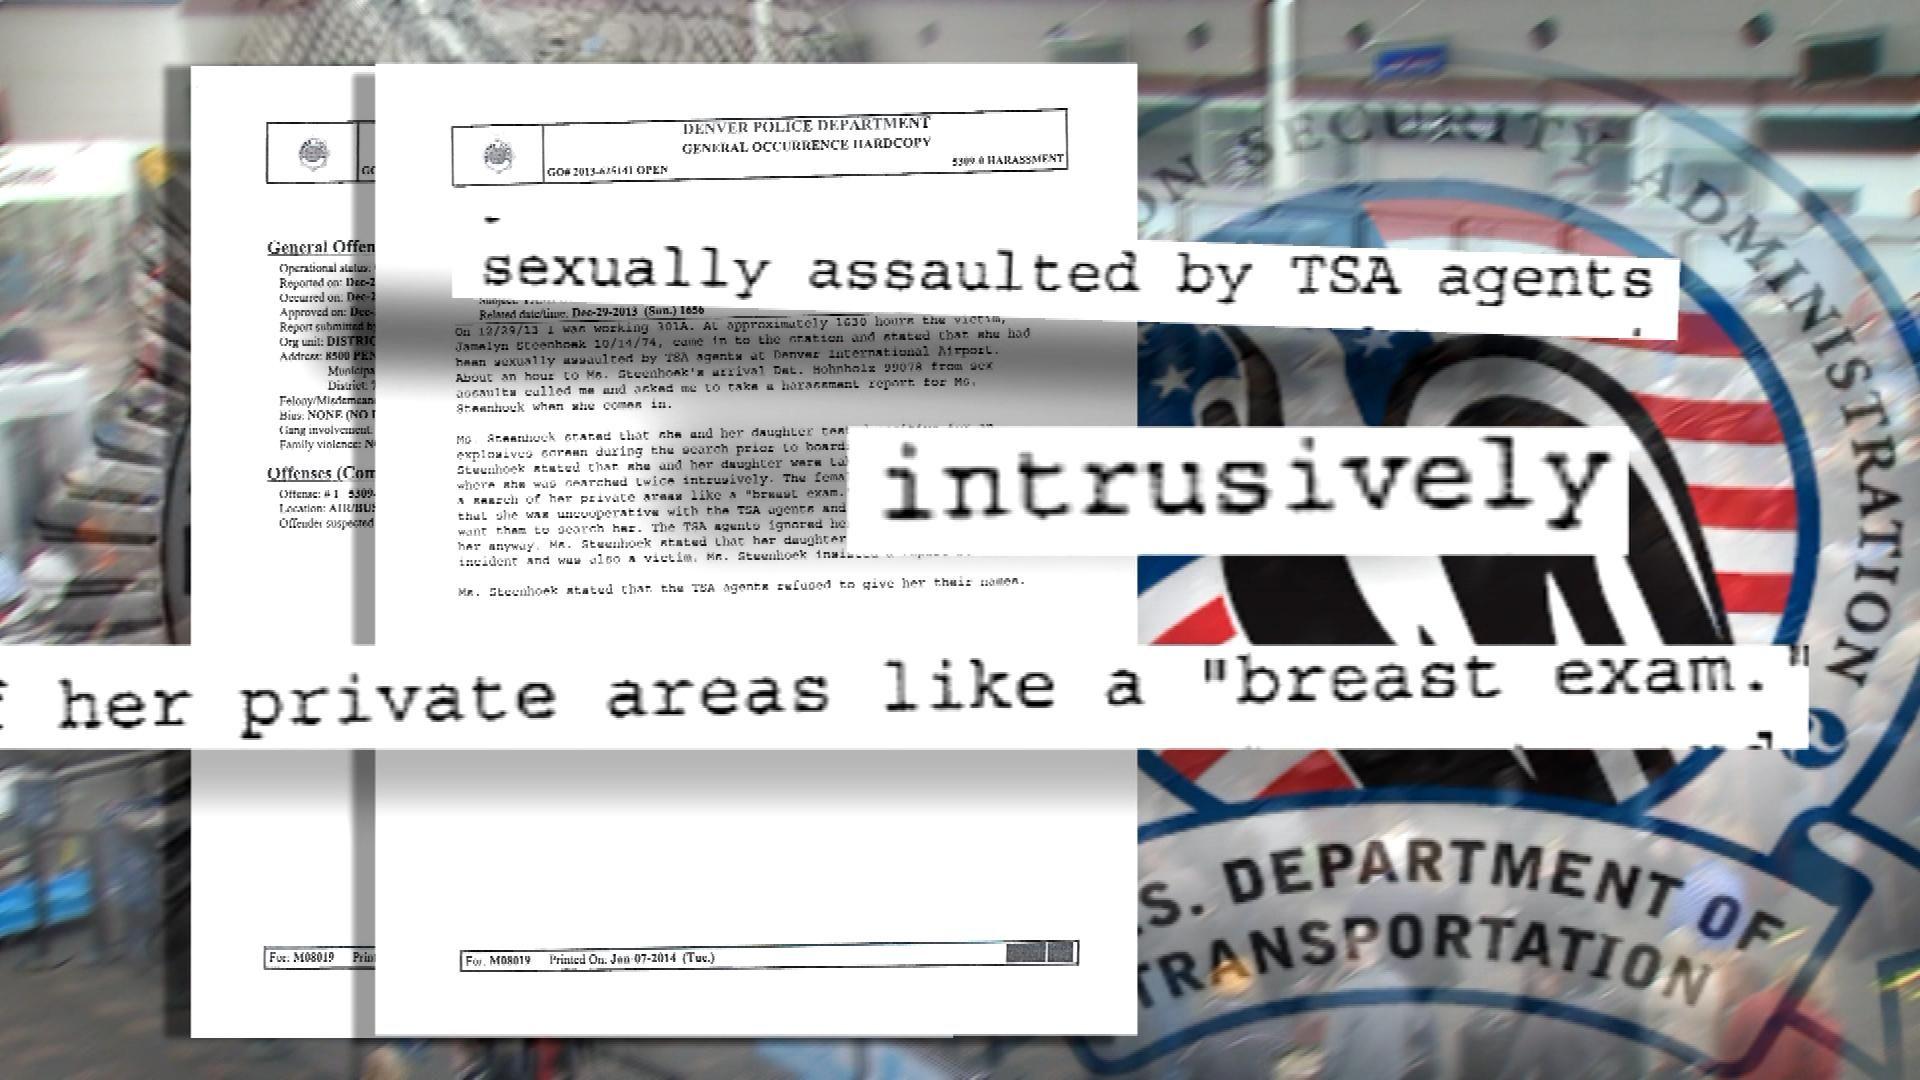 Tsa email jokes sexual harassment